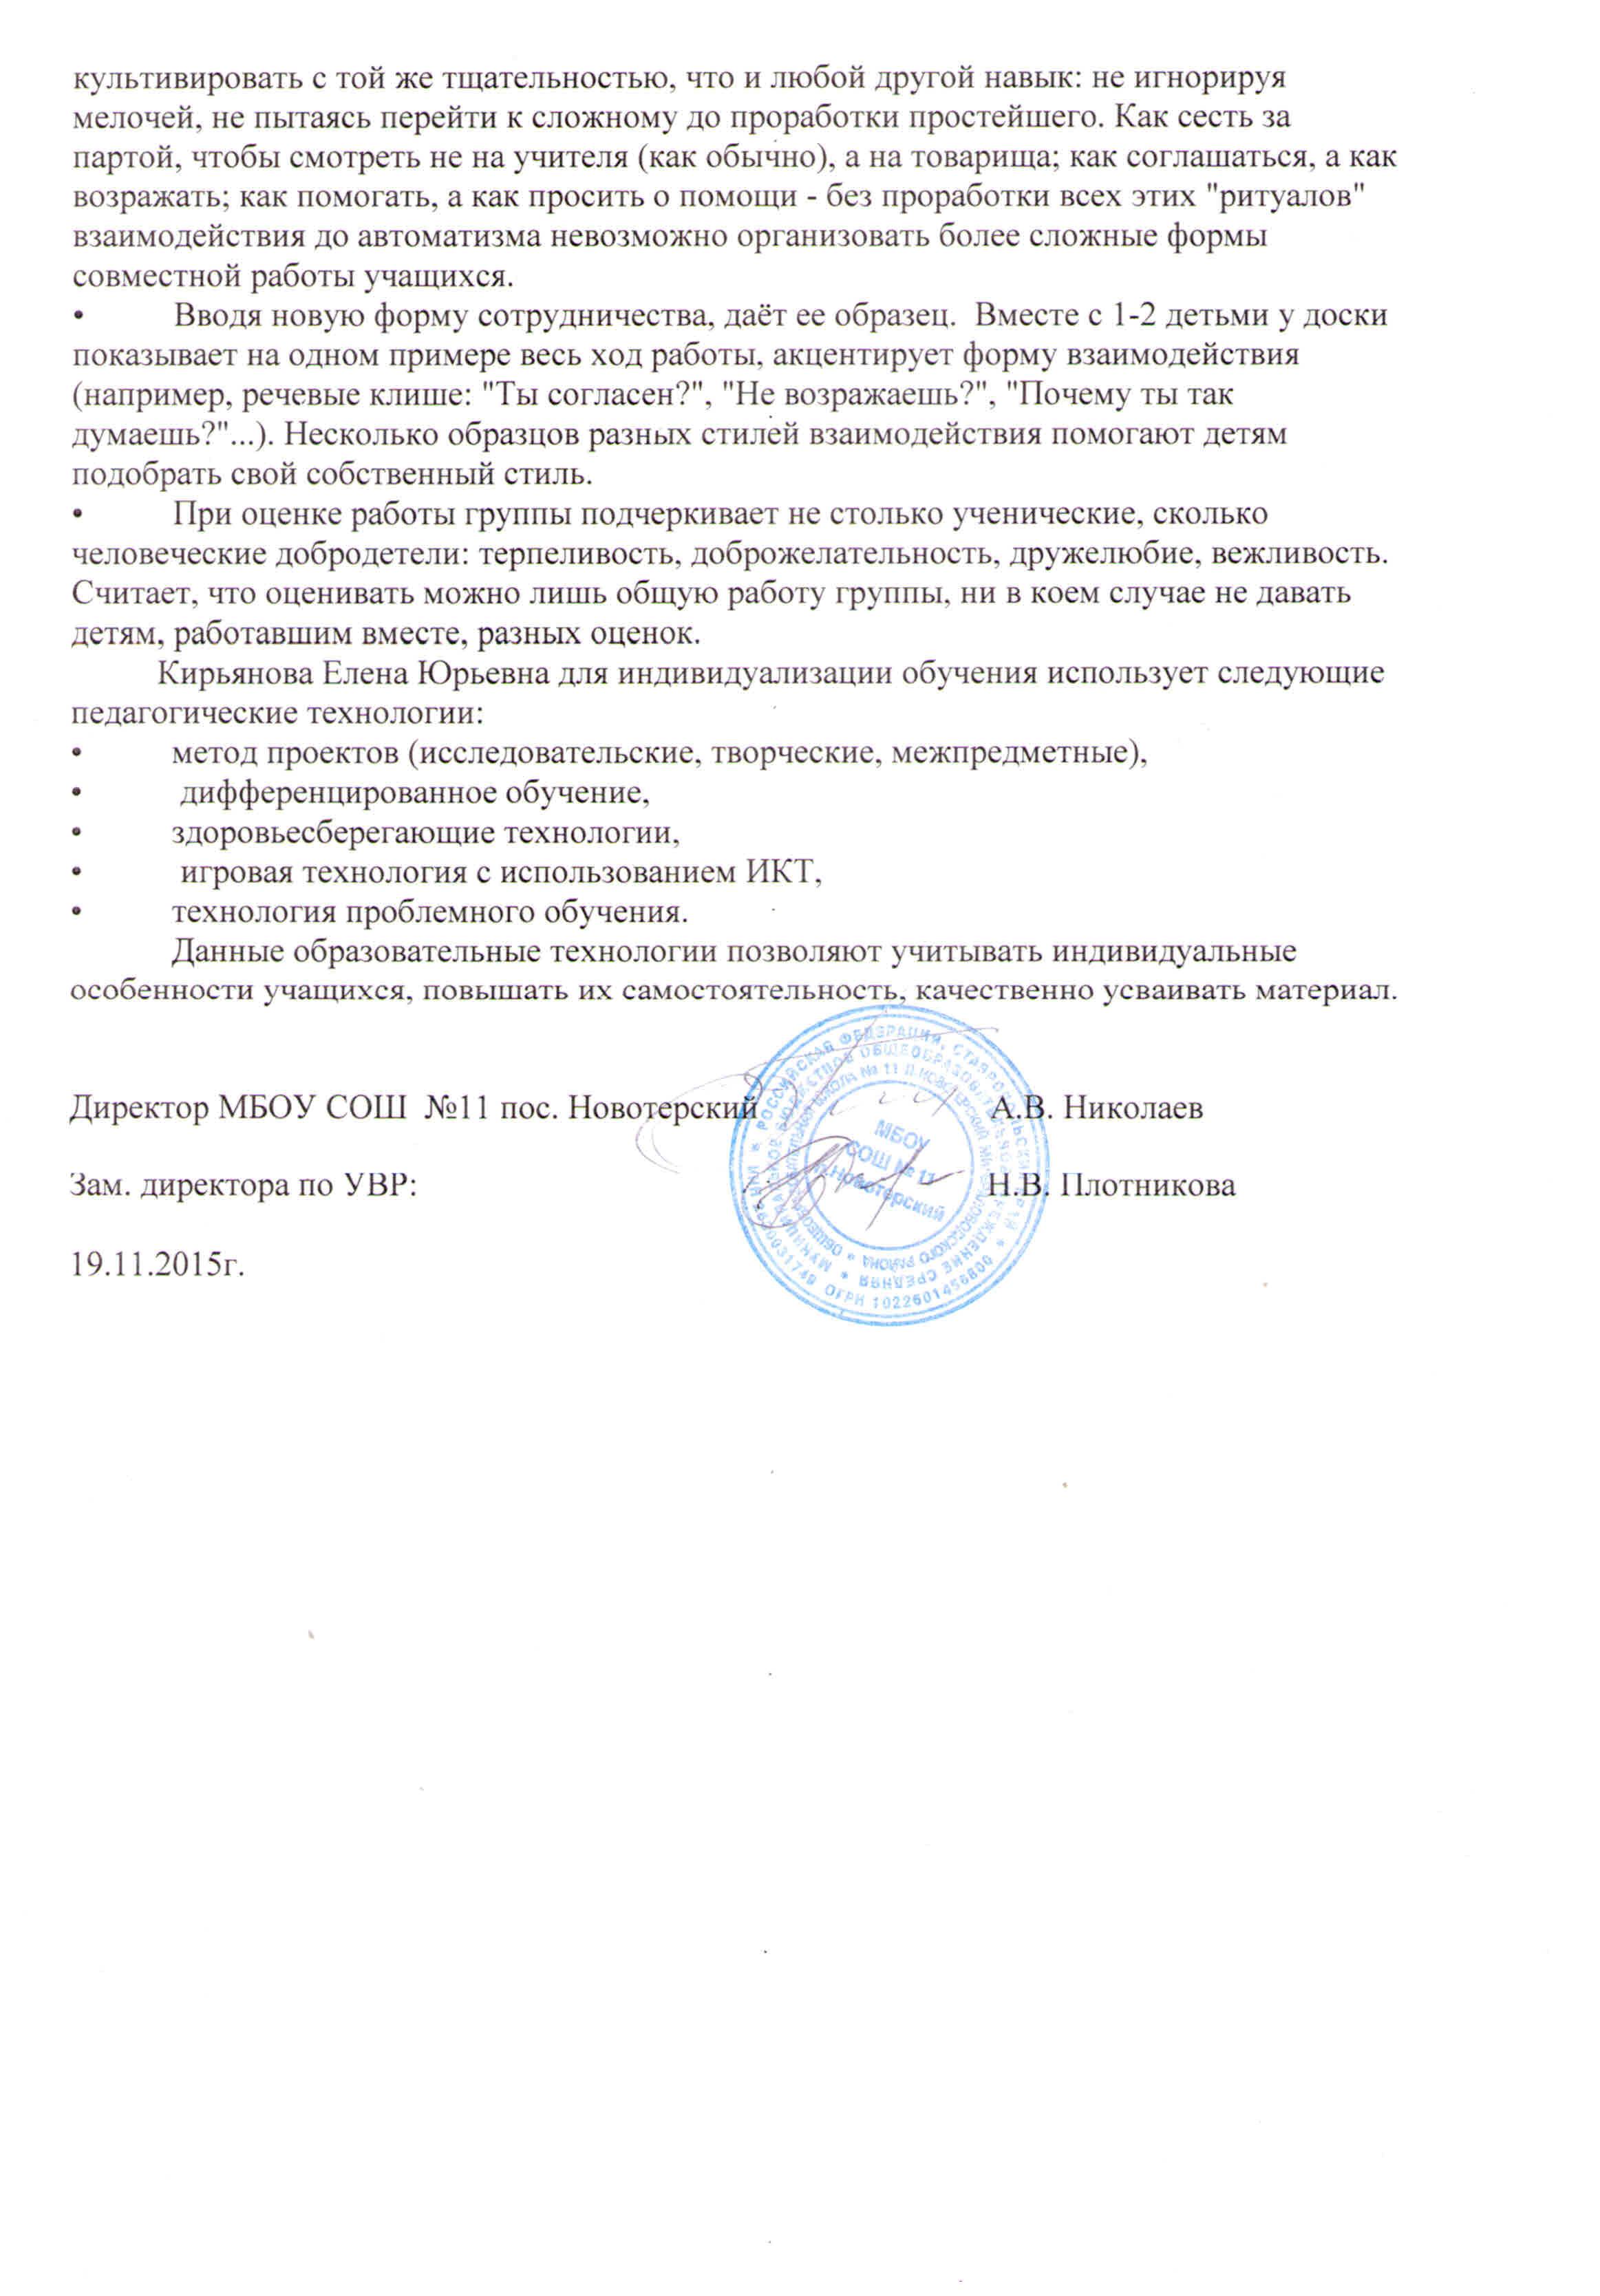 C:\Users\Сергей\Desktop\аналитсправка\Document_16.jpg